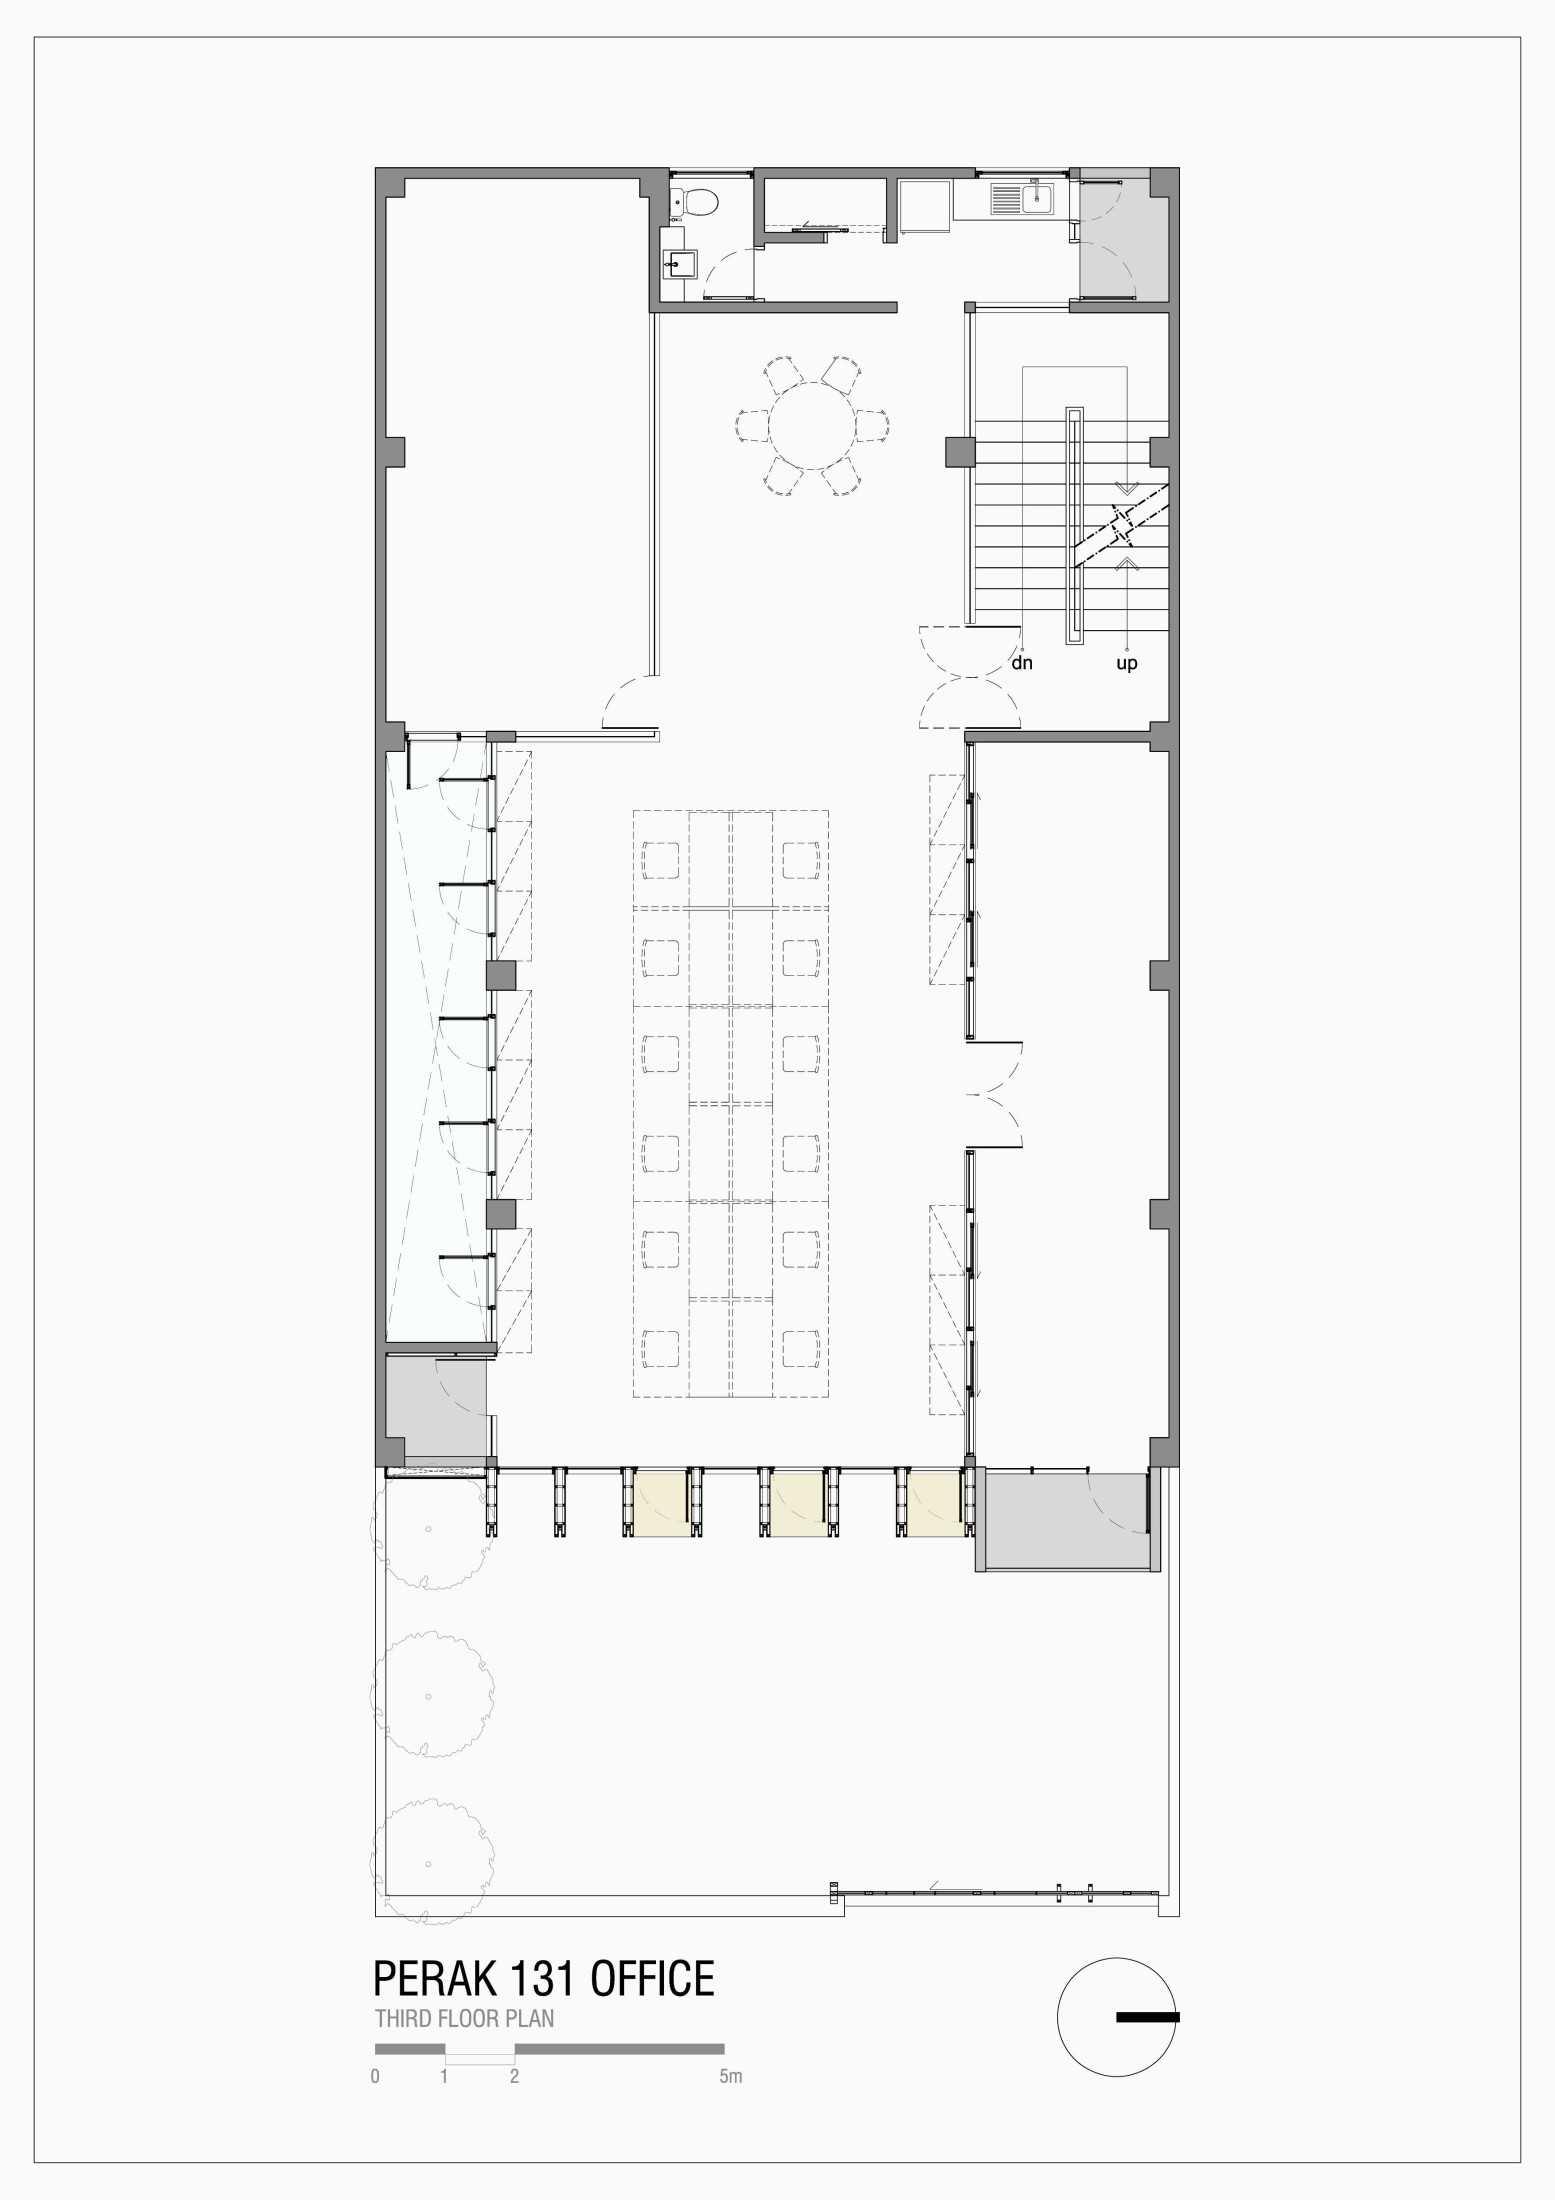 Simple Projects Architecture Pb131 Office Jl.perak Barat 131, Surabaya - Indonesia Jl.perak Barat 131, Surabaya - Indonesia Simple-Projects-Architecture-Pb131-Office  59149